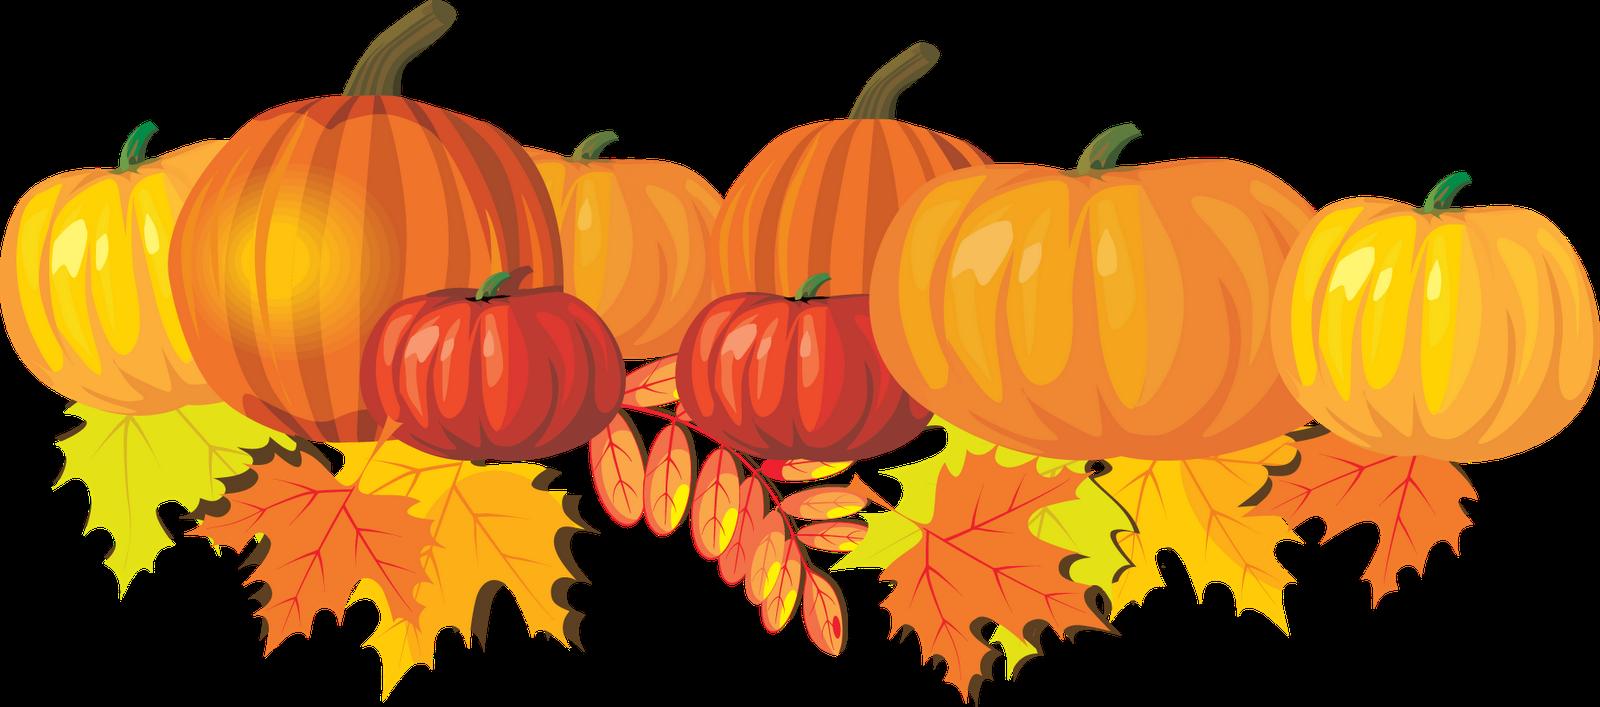 Fall pumpkin clipart 2